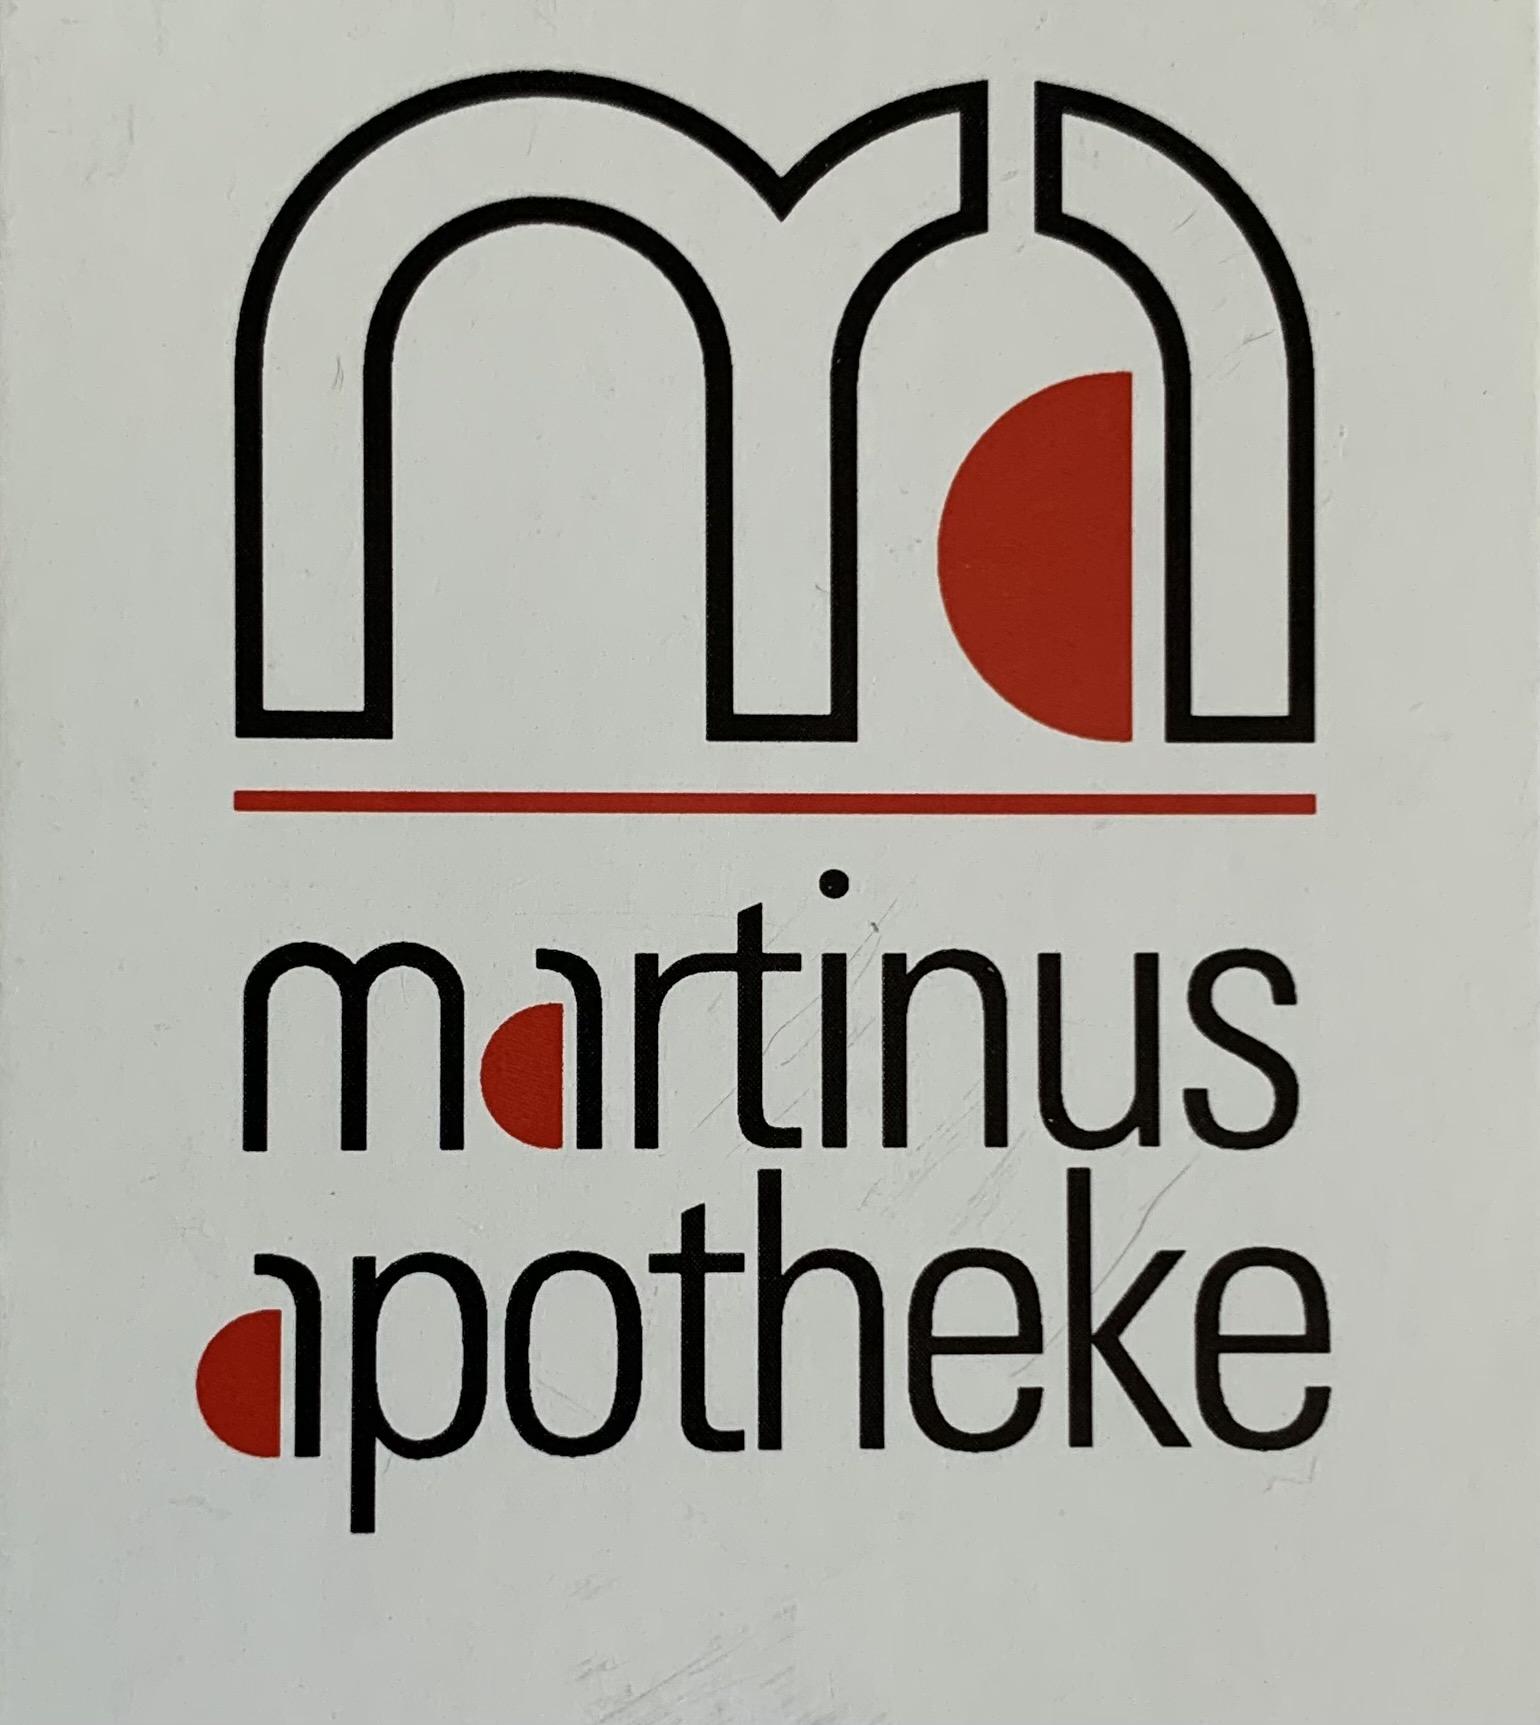 Martinus Apotheke